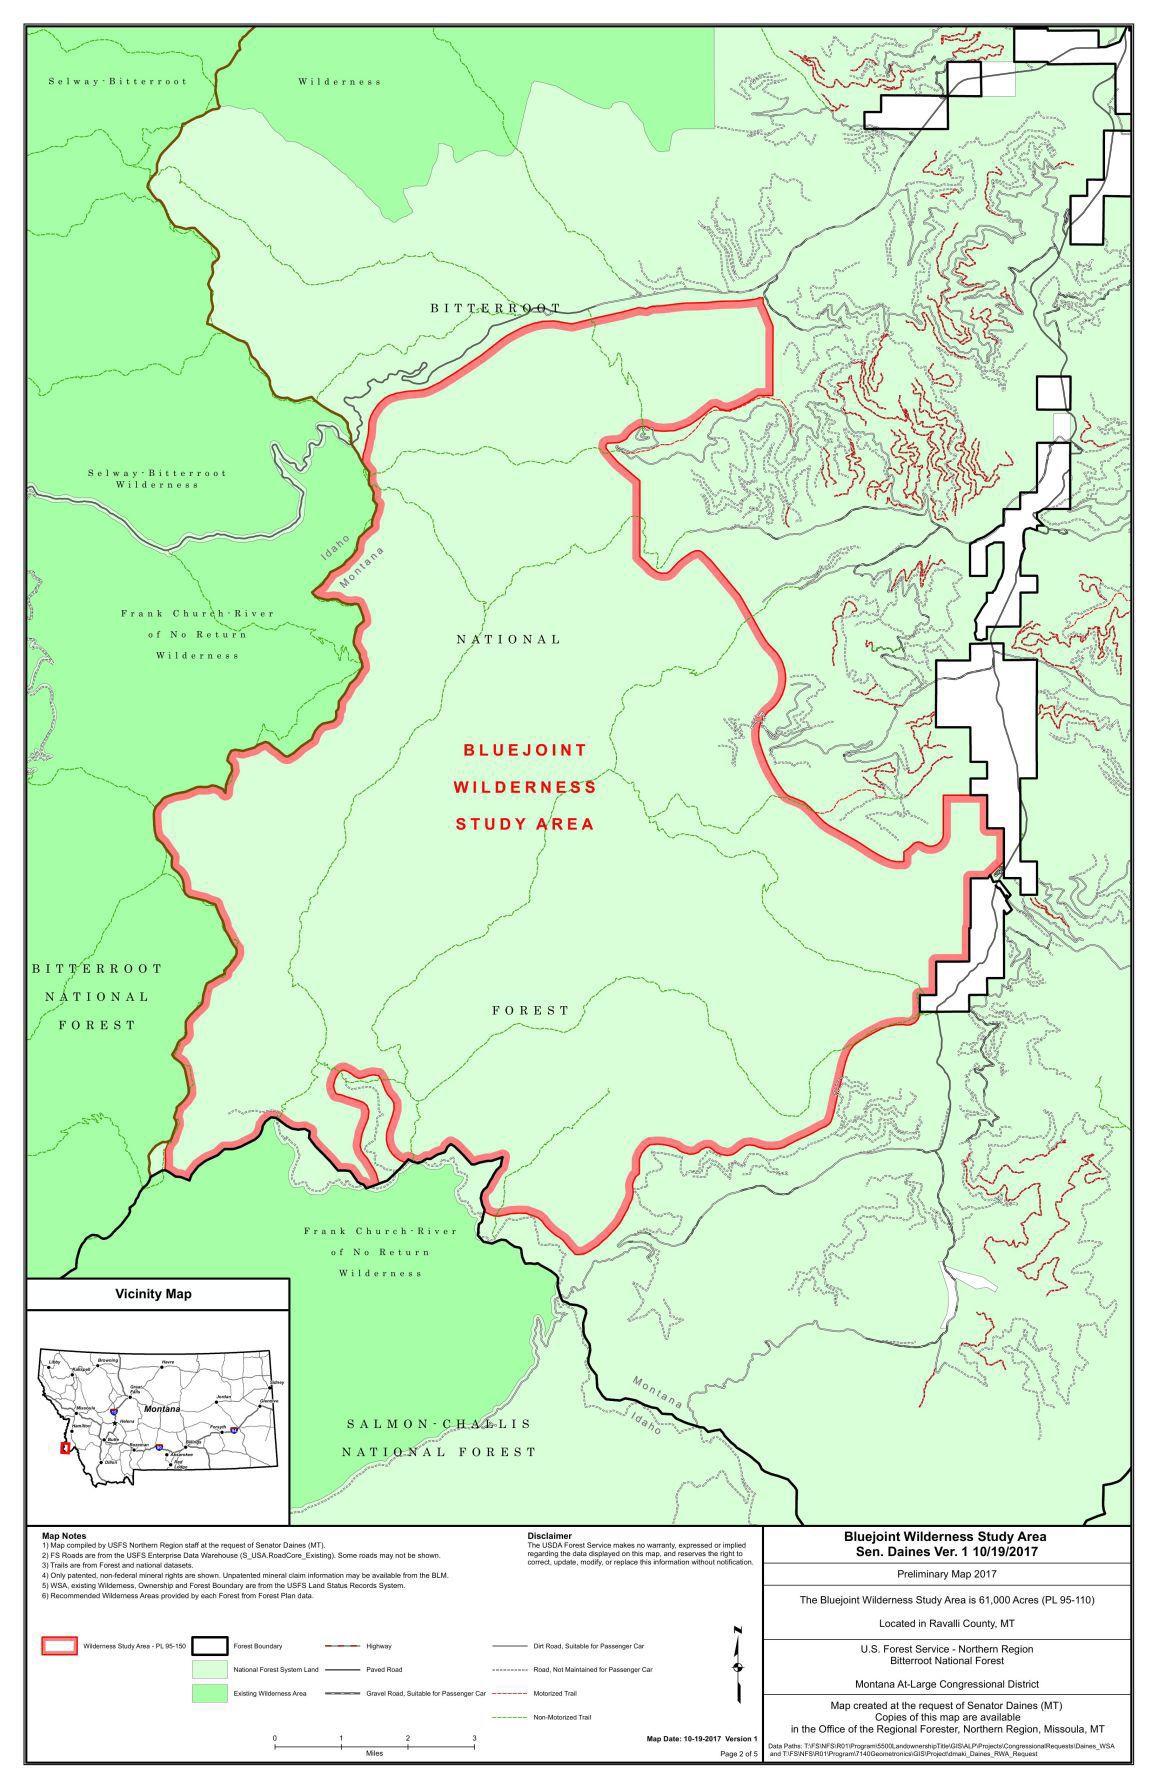 Bluejoint Wilderness Study Area